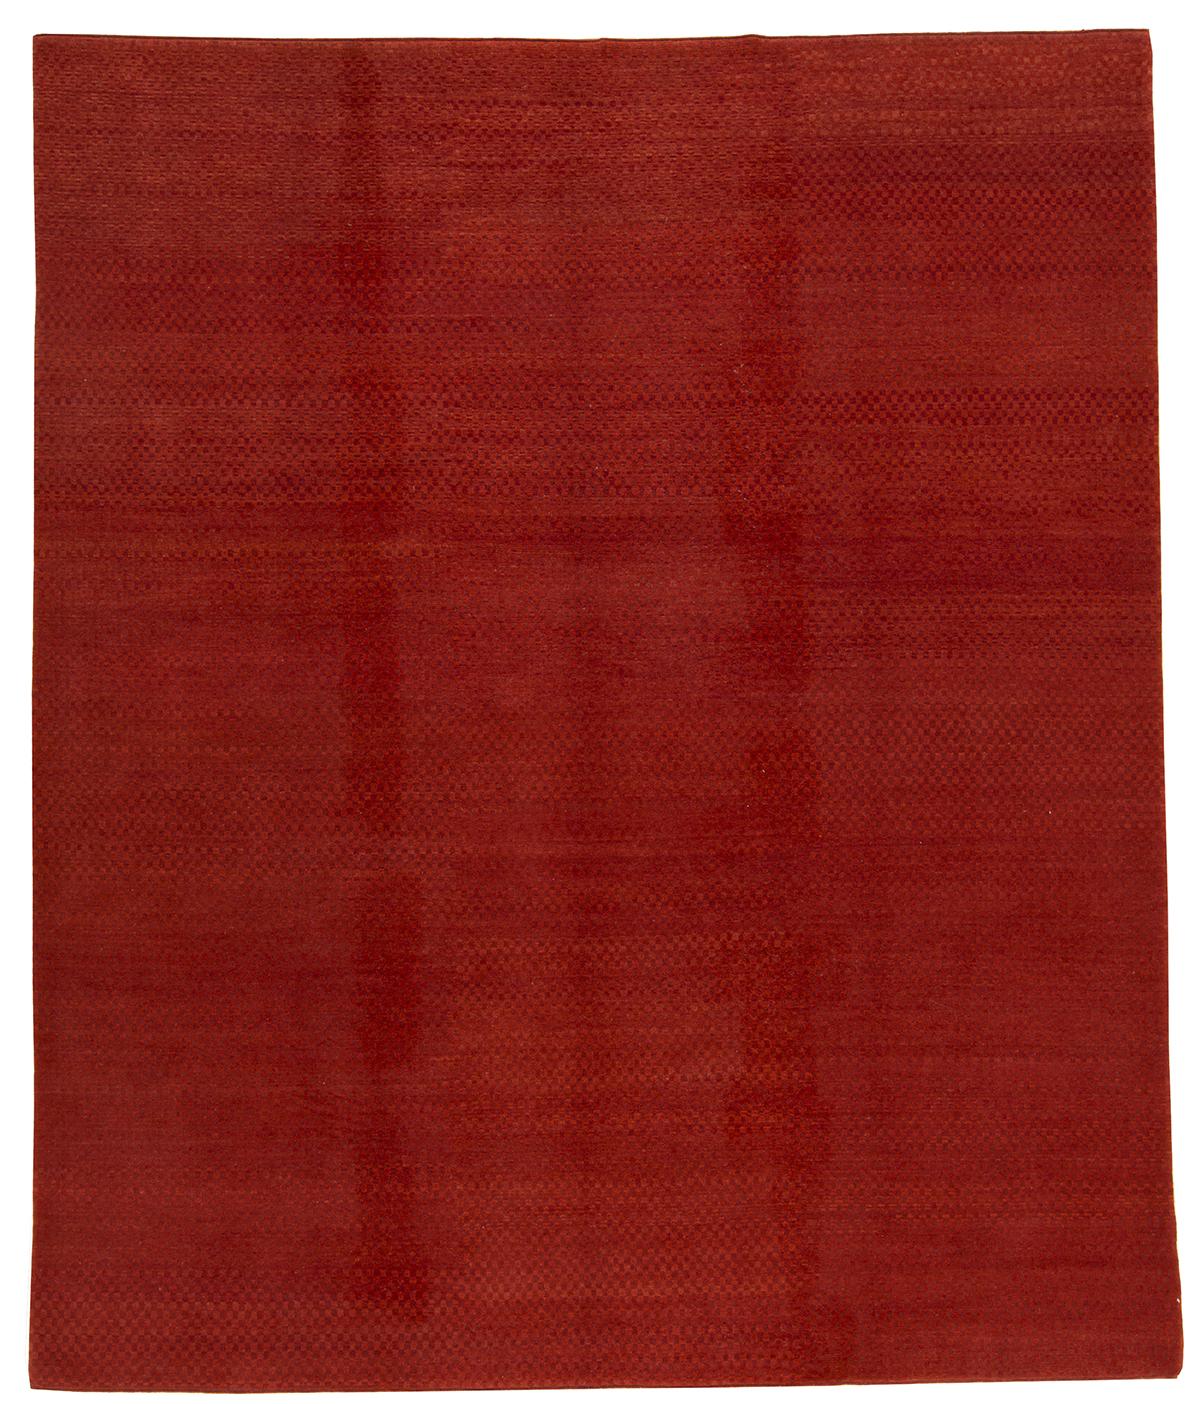 Yardo - Shomimi red.jpg